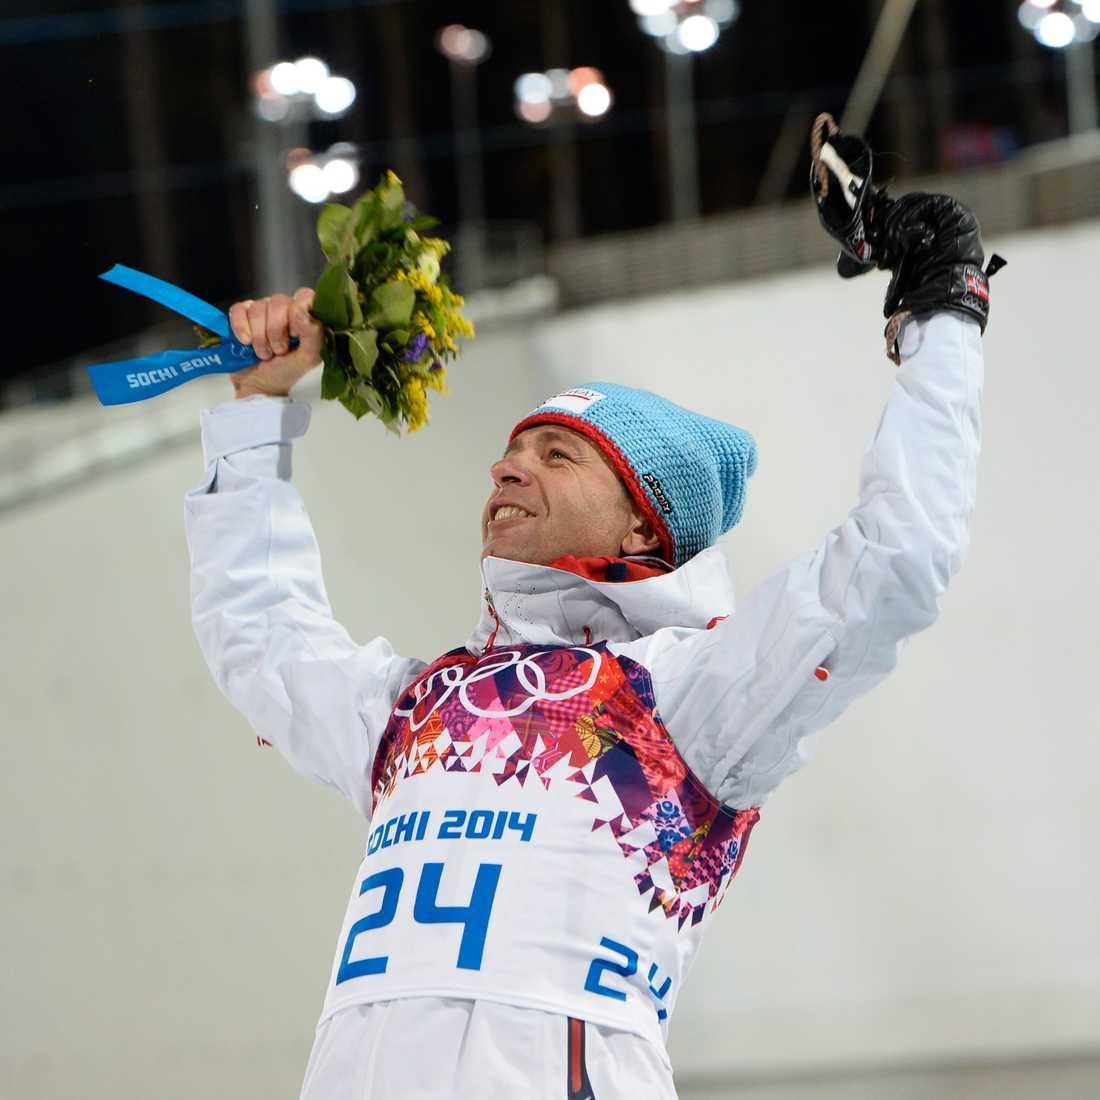 Björndalen efter OS-guld 2014.